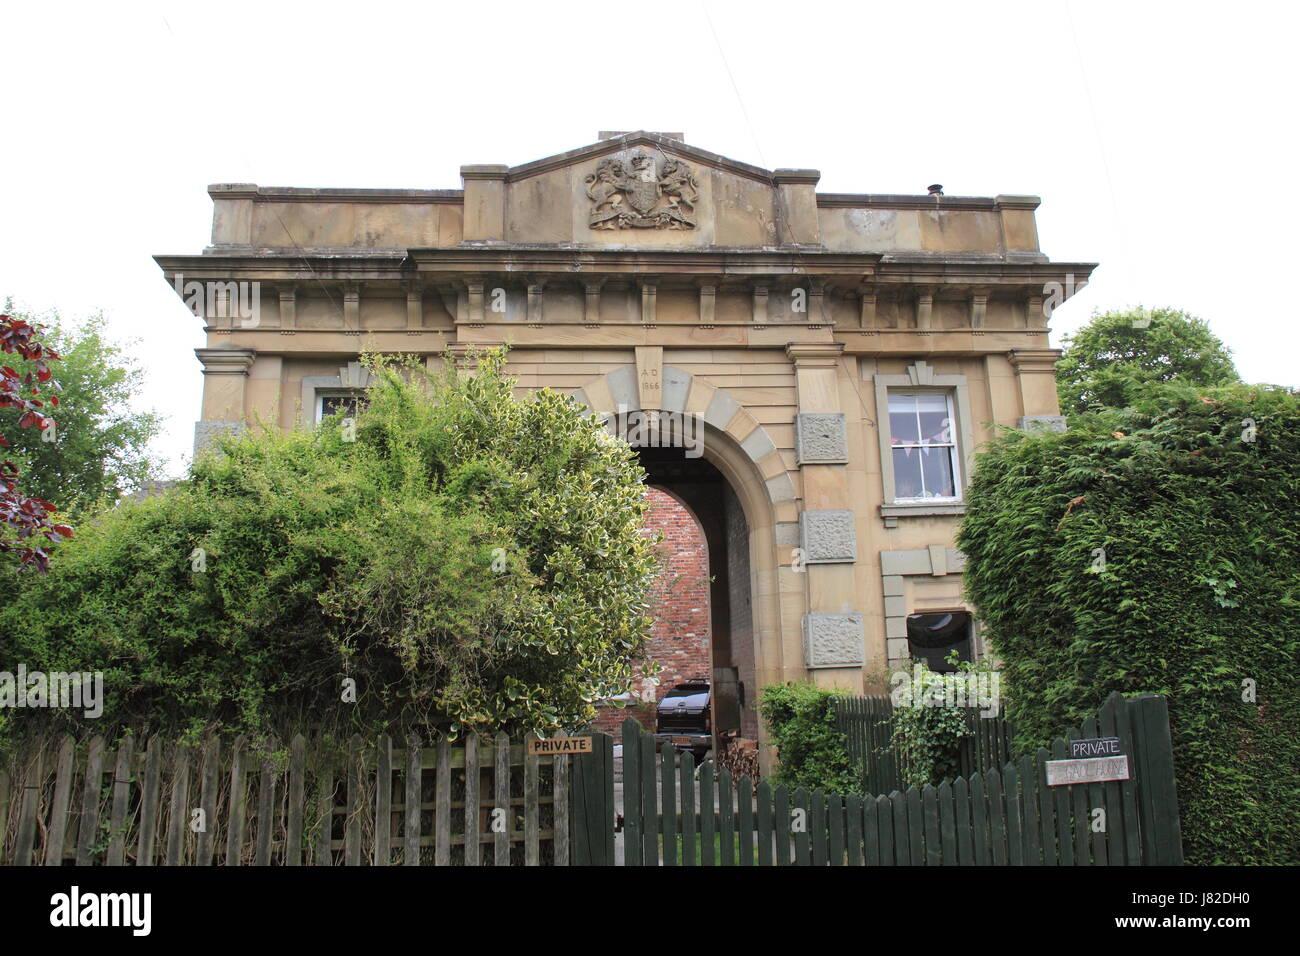 The Old Gaol, Montgomery, Montgomeryshire, Powys, Wales, Great Britain, United Kingdom, UK, Europe - Stock Image